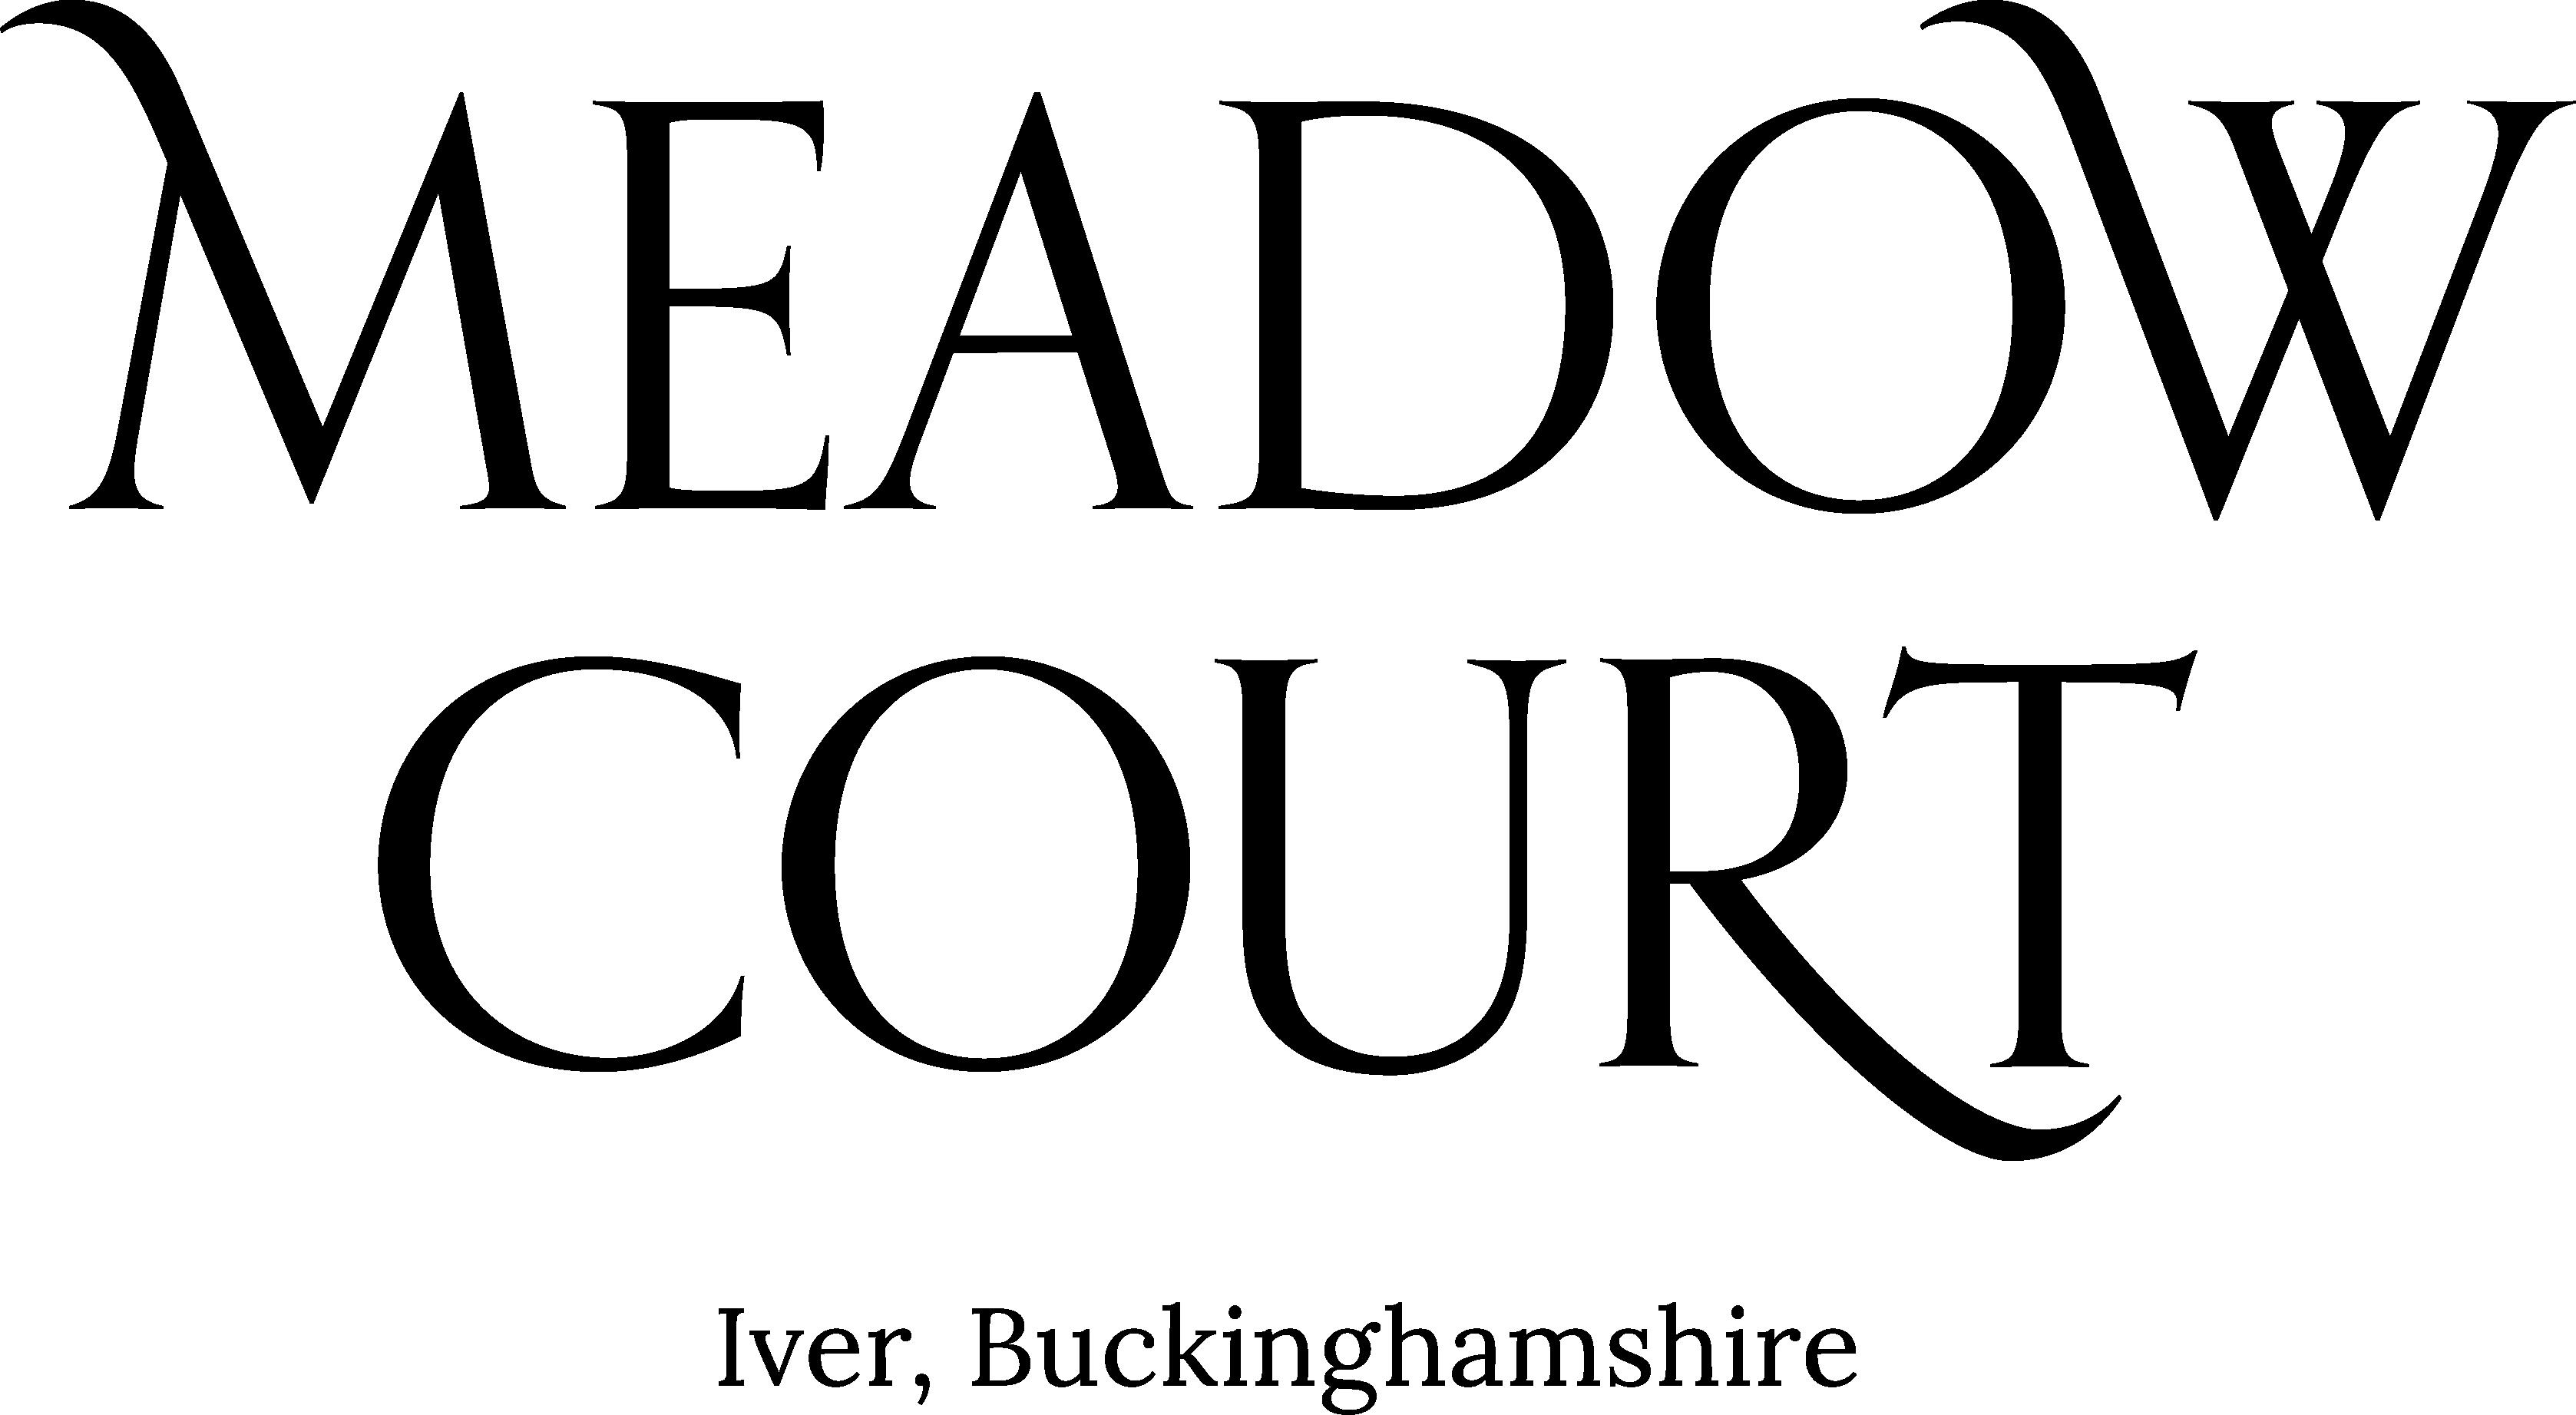 Meadow Court full logo 39mm min height BLACK RGB